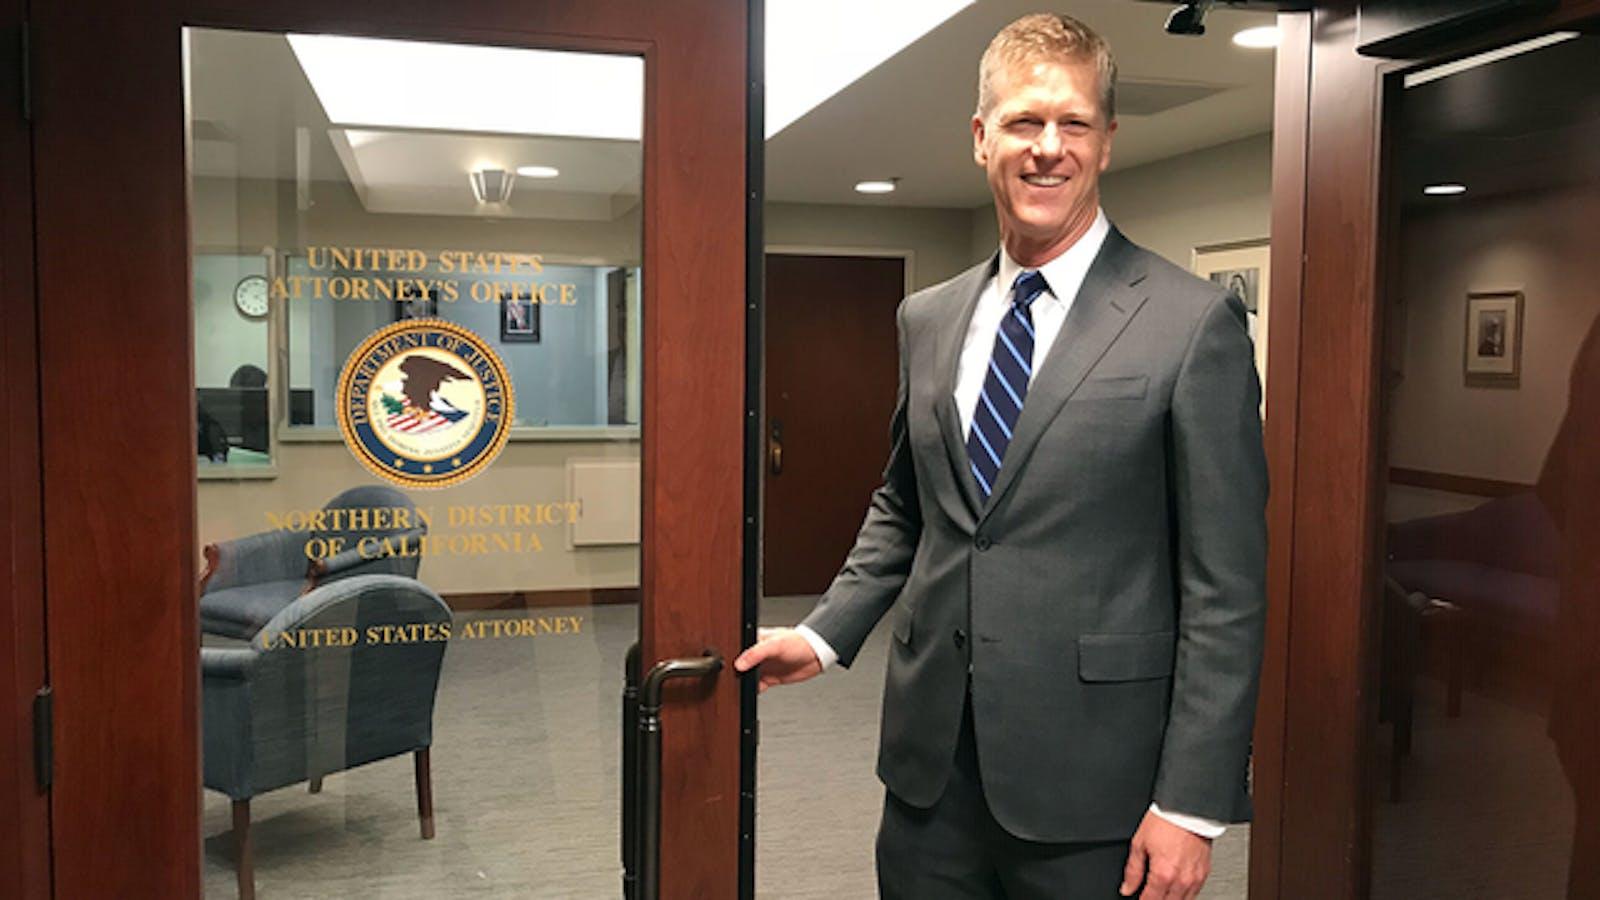 New U.S. Attorney David Anderson is sworn in in January. Photo: San Francisco U.S. Attorney's Office